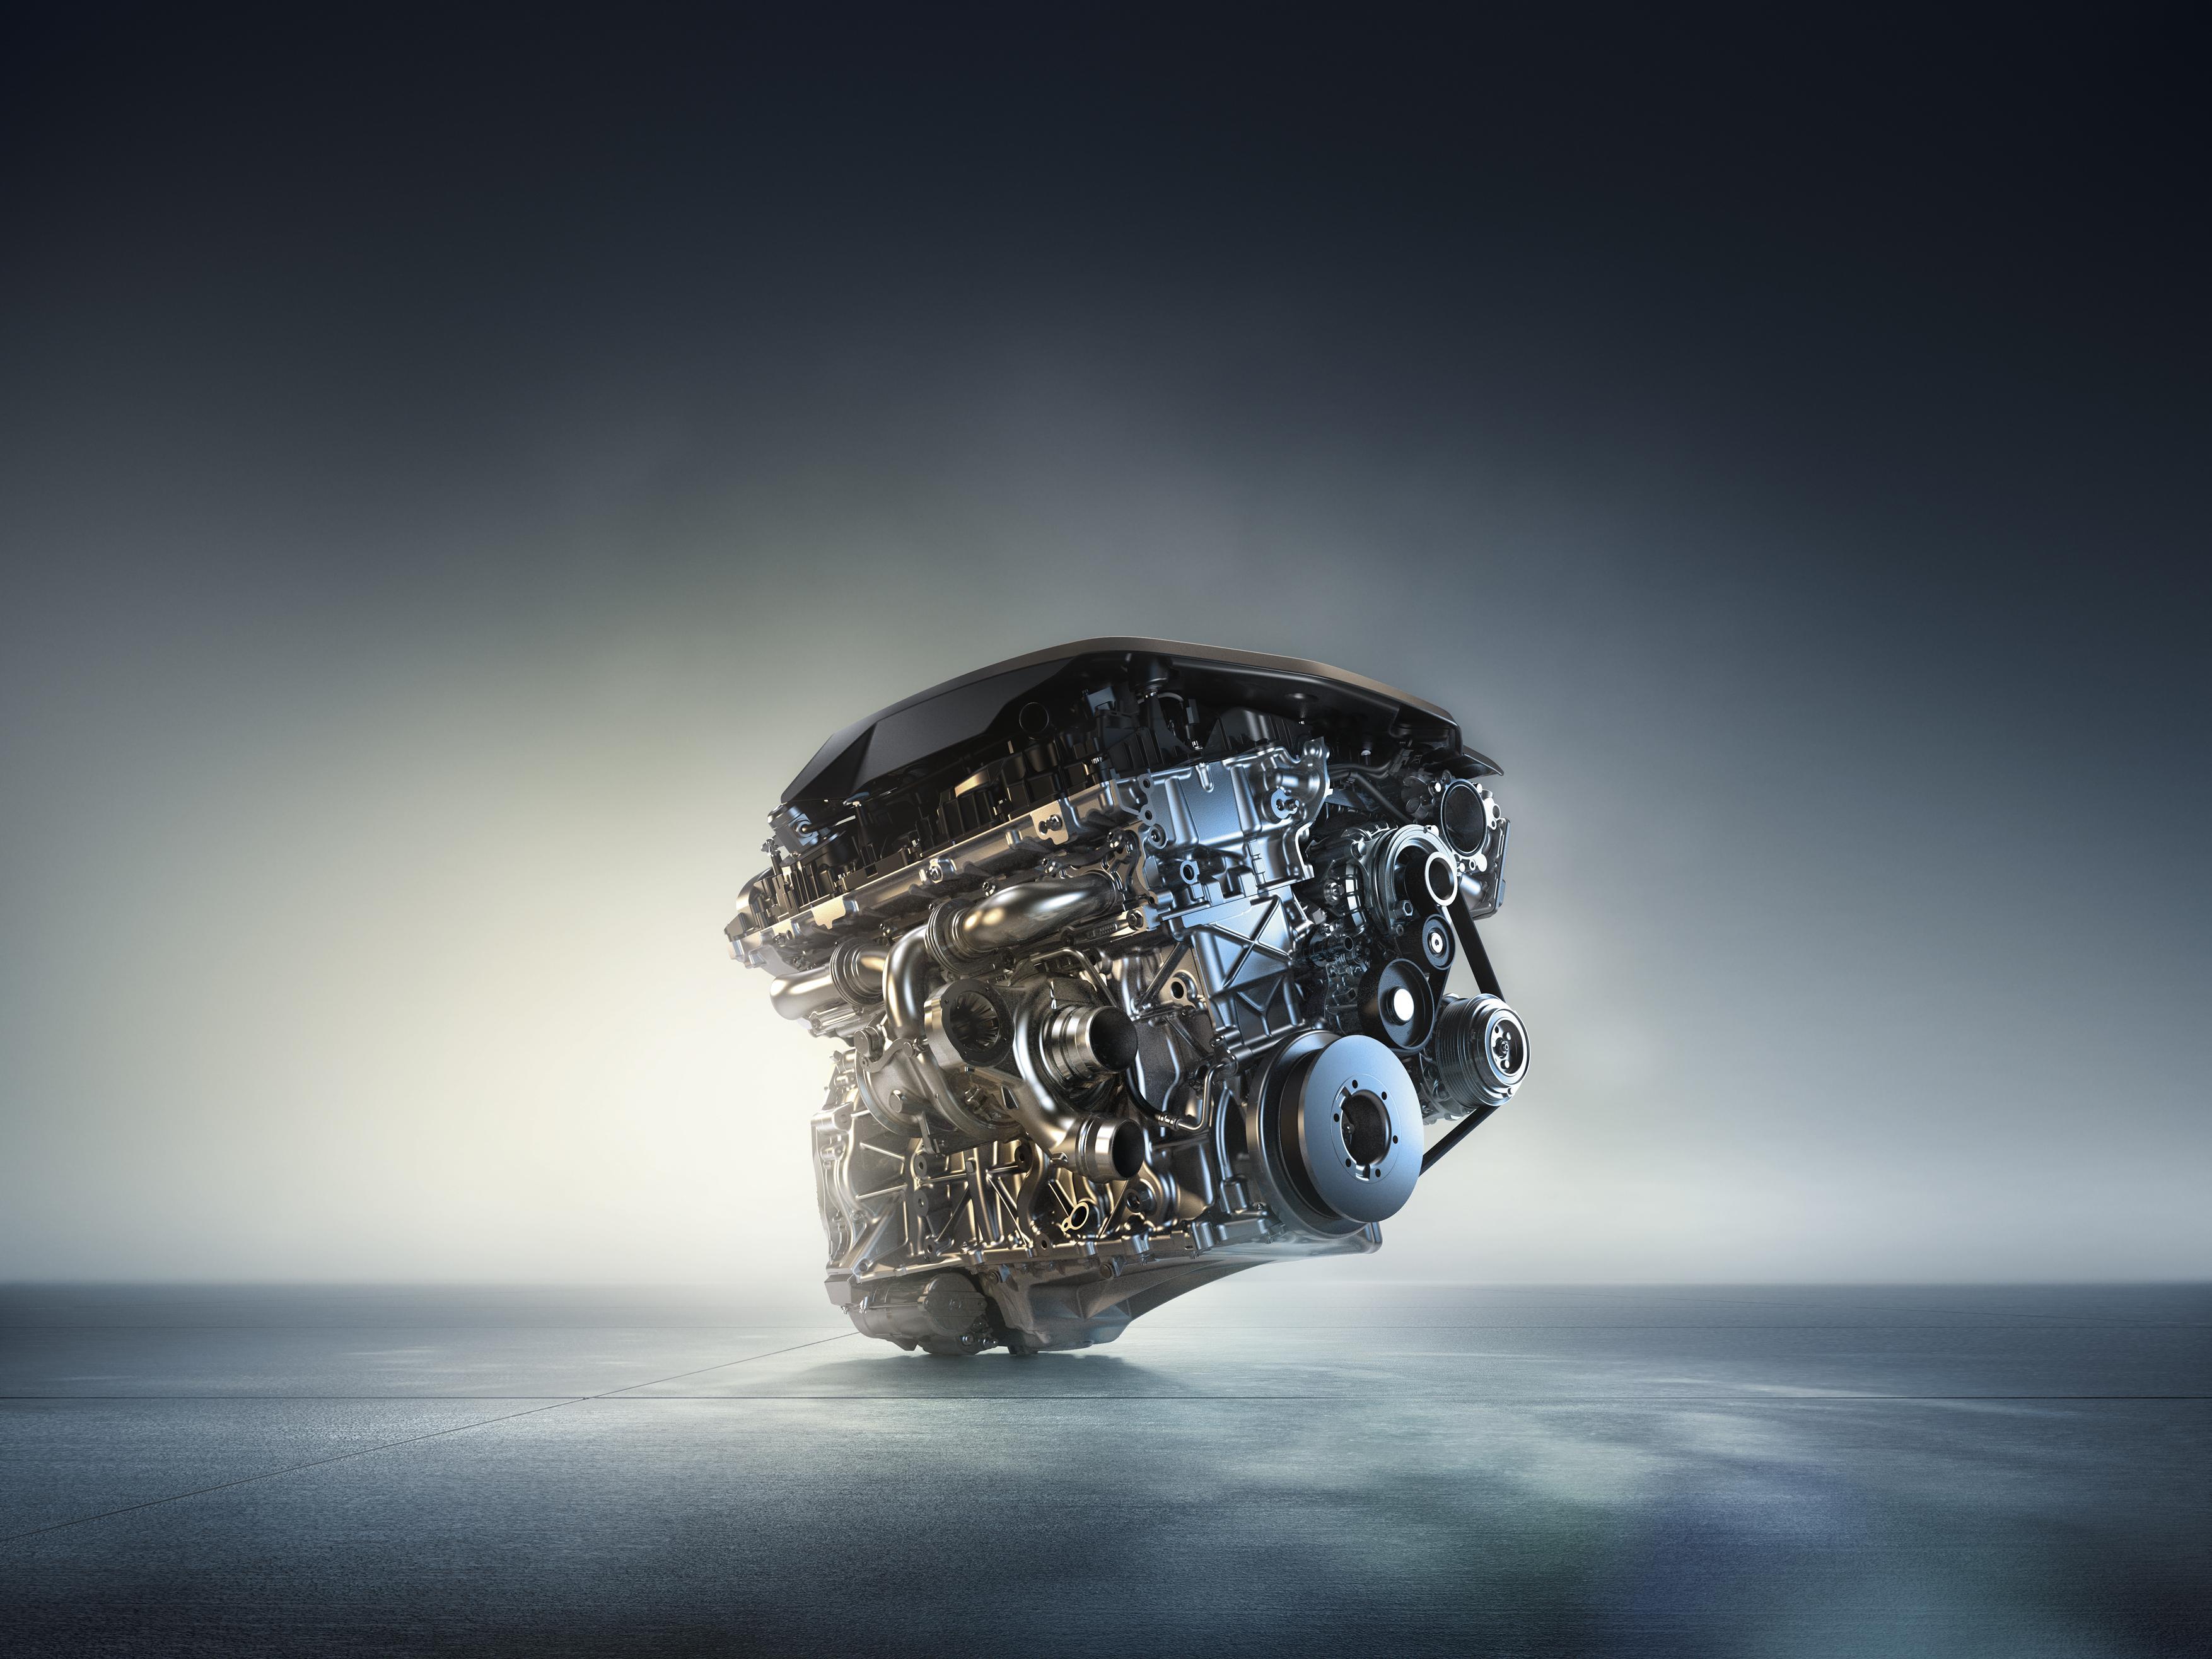 BMW_B58_Engine